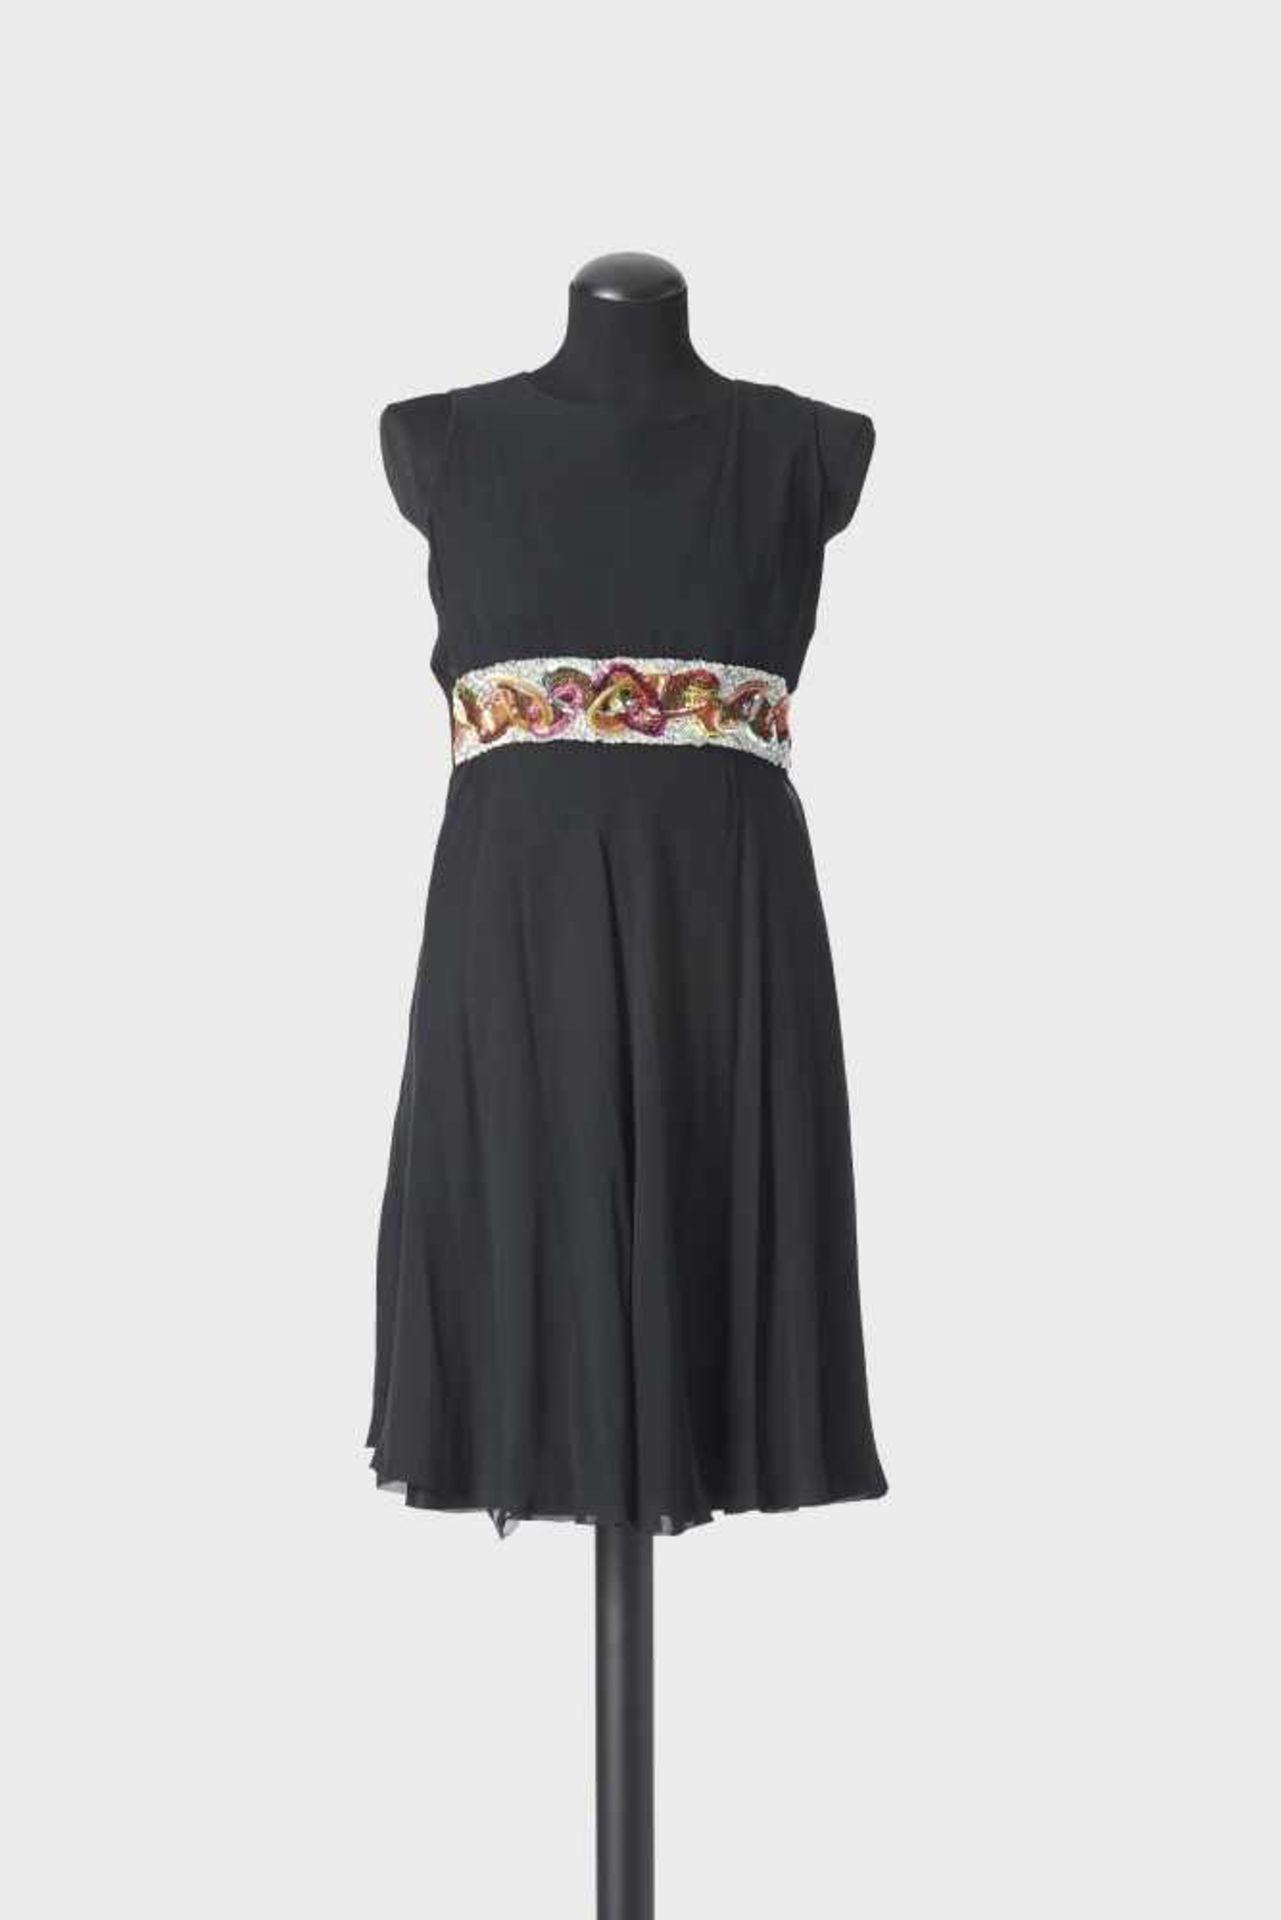 Cocktail DressMarc Bohan for Christian Dior Haute Couture, Paris Haute Couture Collection Spring/